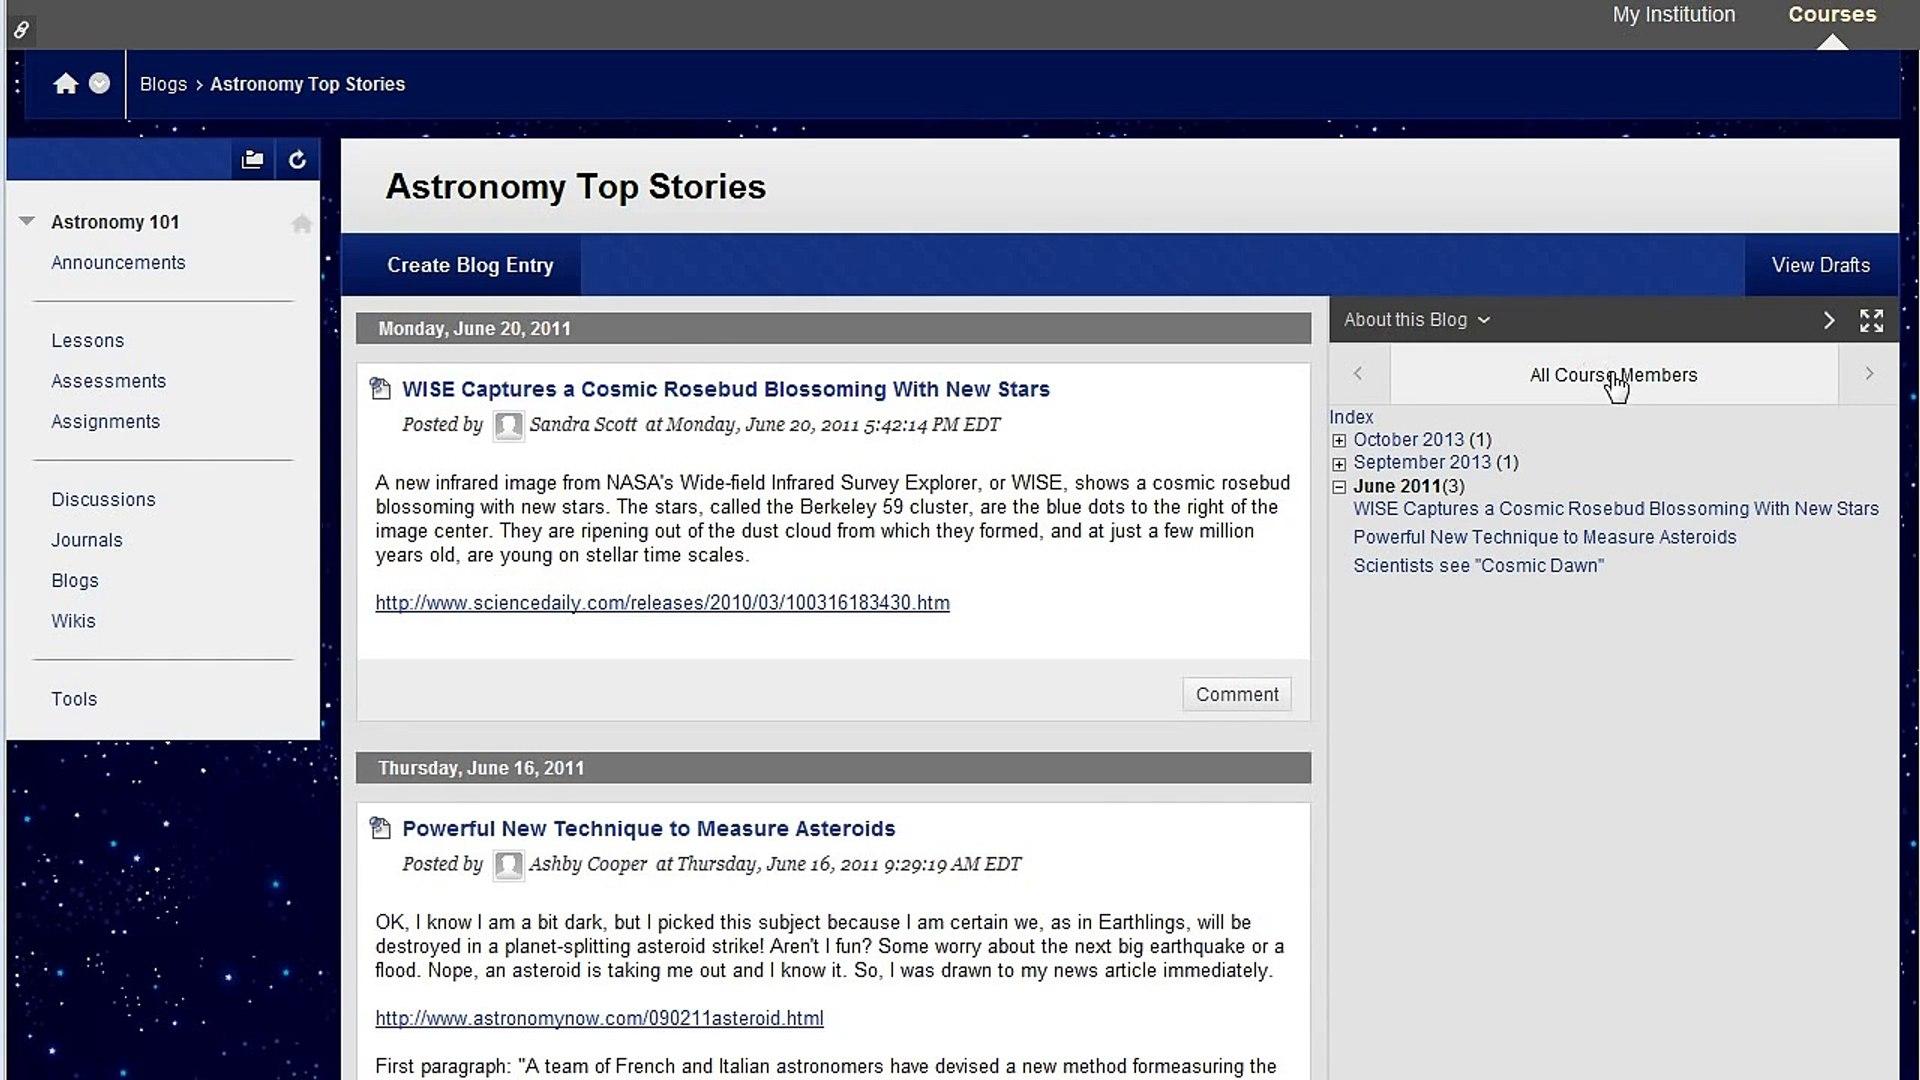 Creating and Editing a Blog Entry